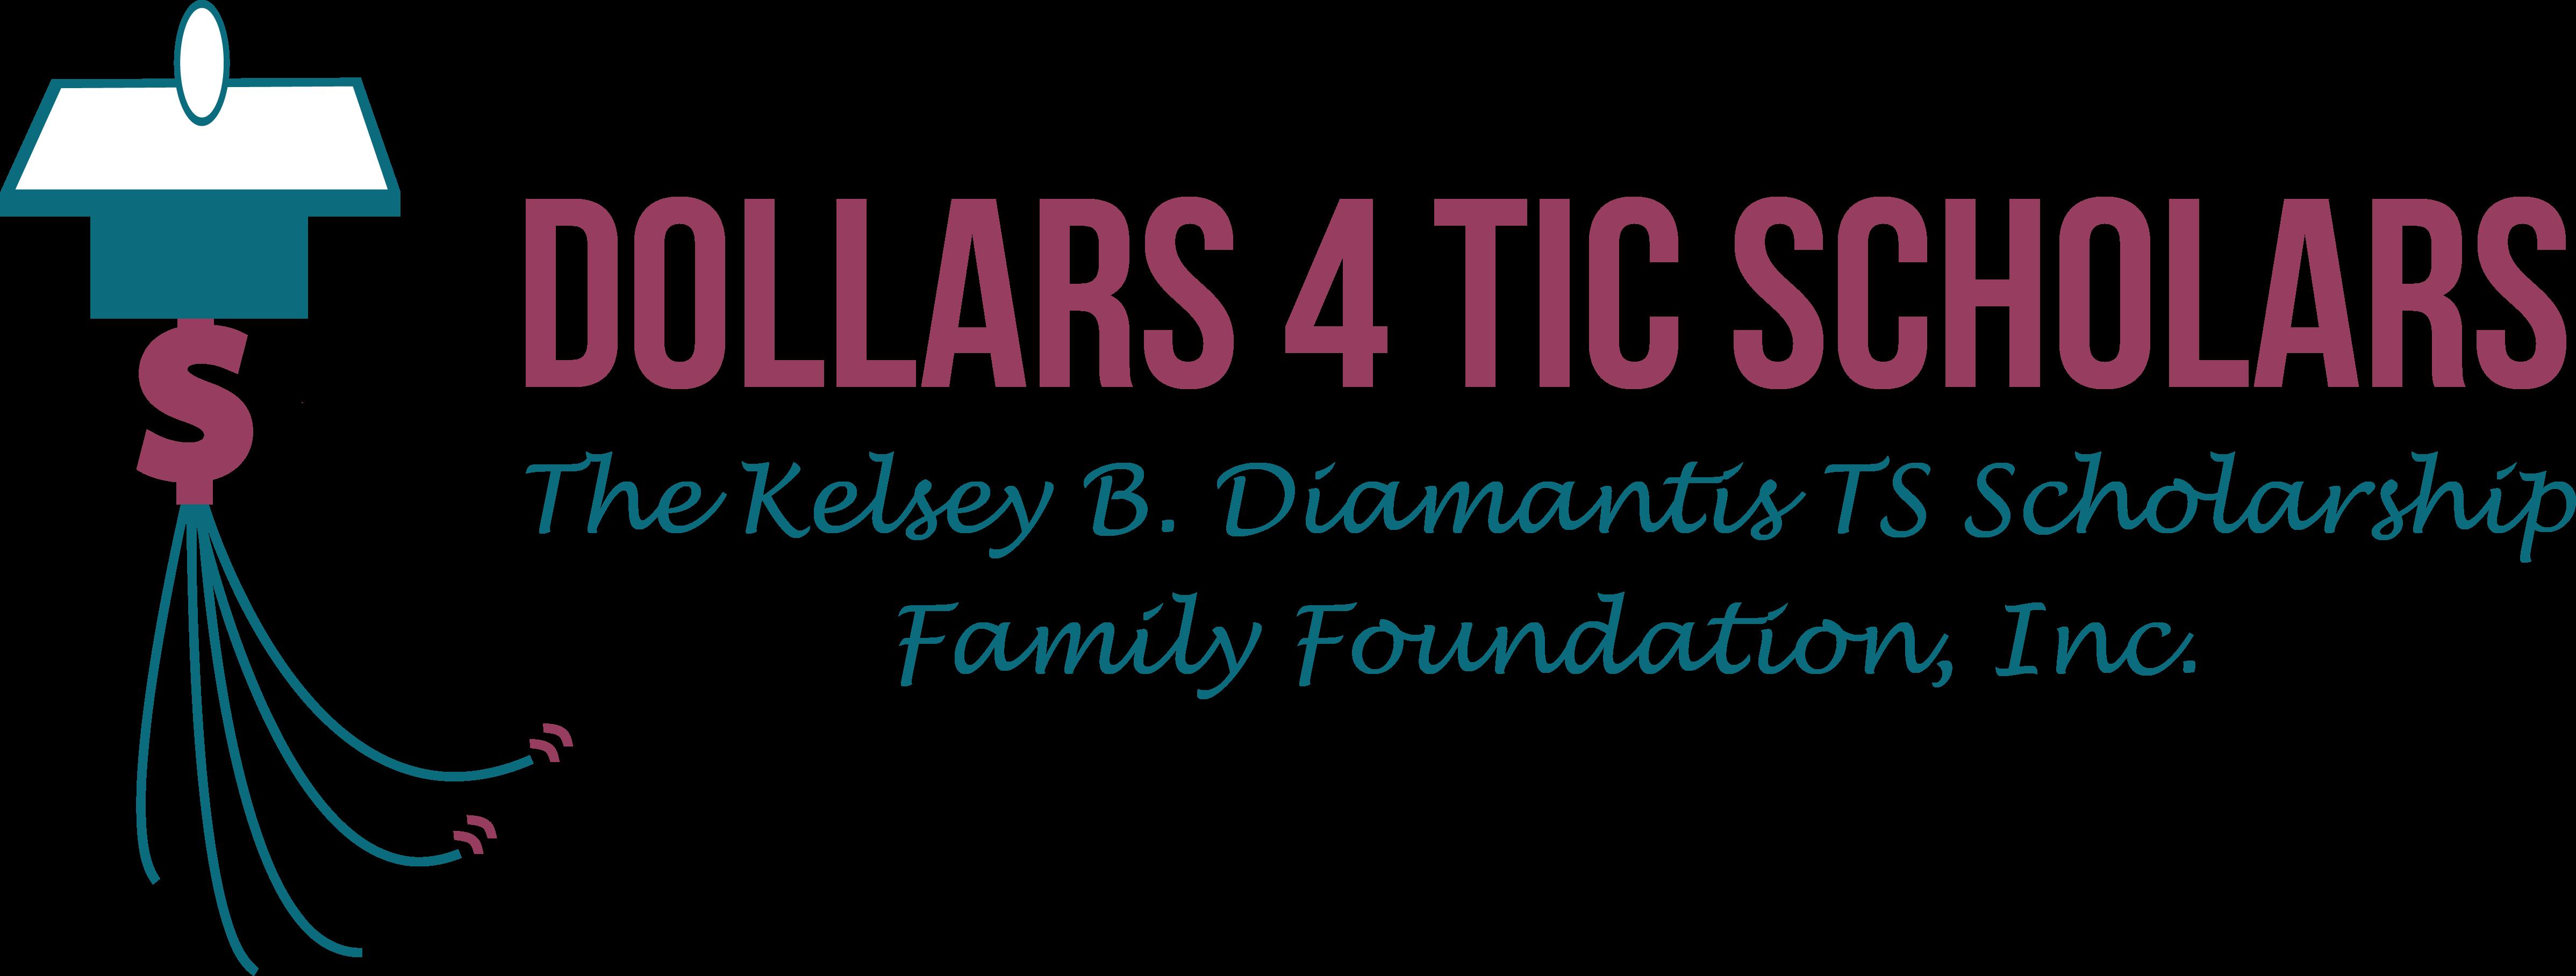 Dollars-4-Tic-Scholars